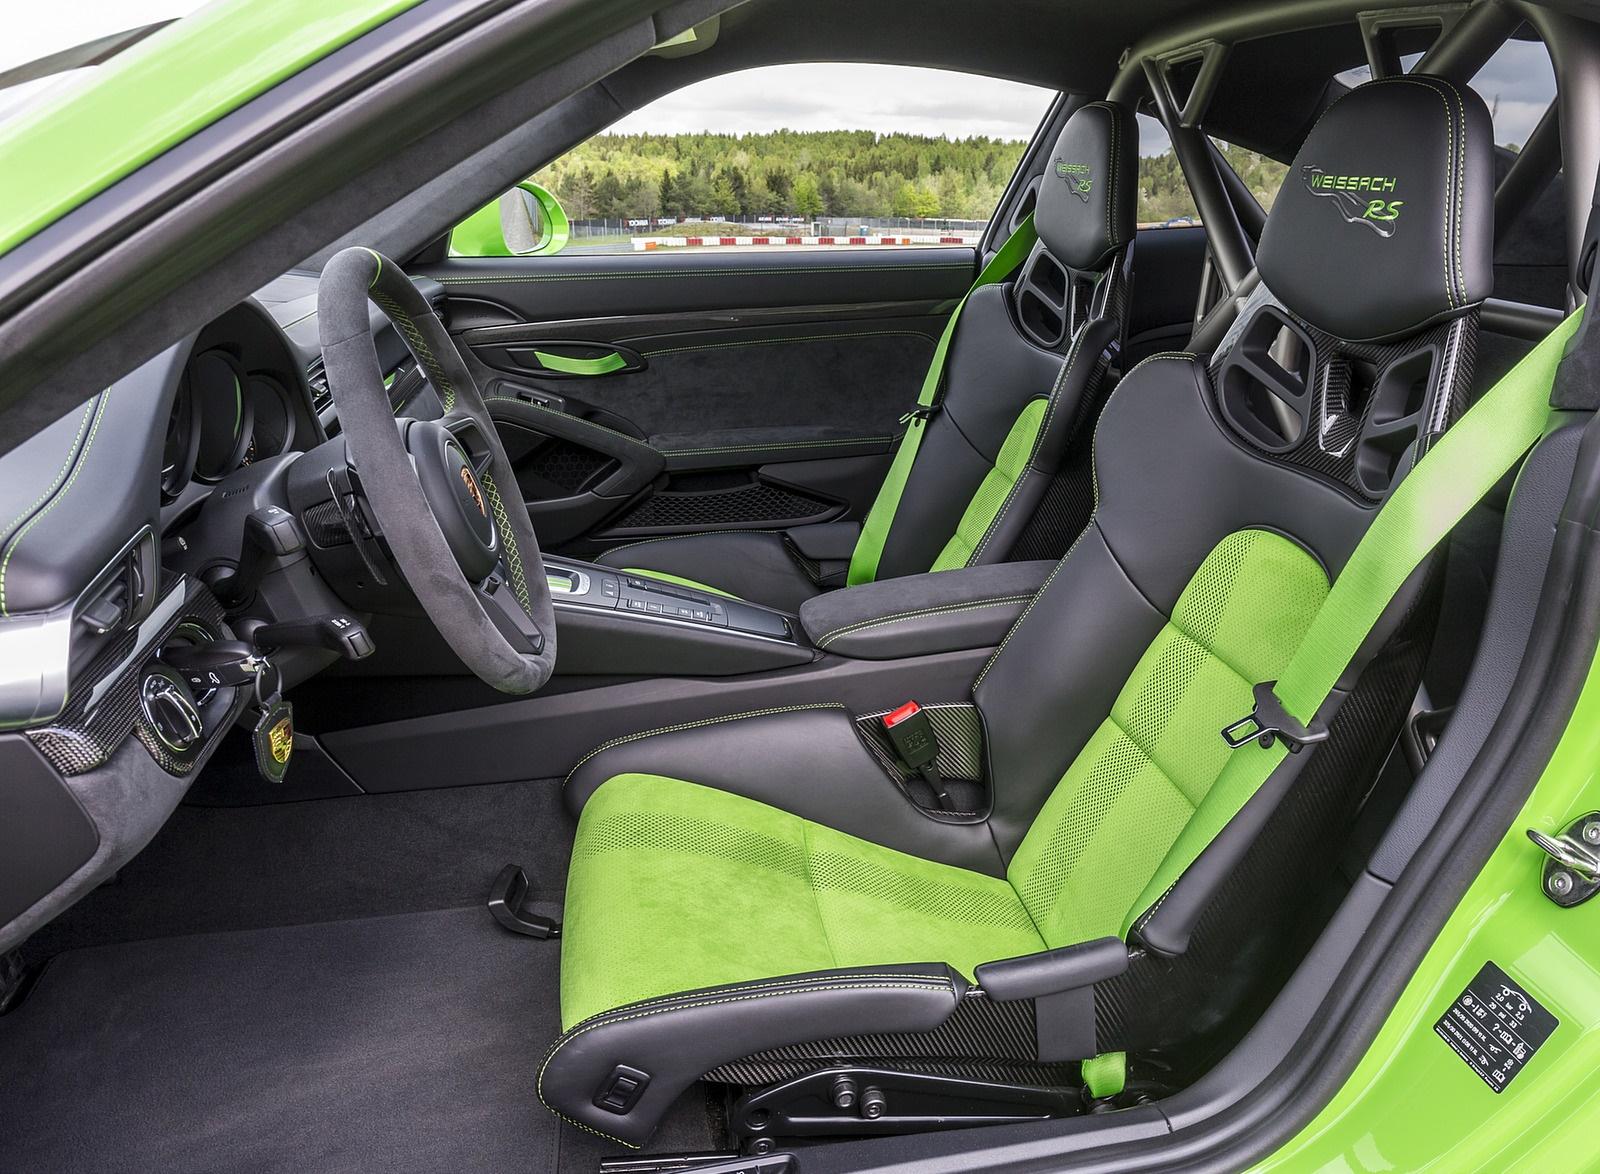 2019 Porsche 911 Gt3 Rs Weissach Package Color Lizard Green Interior Cockpit Wallpapers 194 Newcarcars